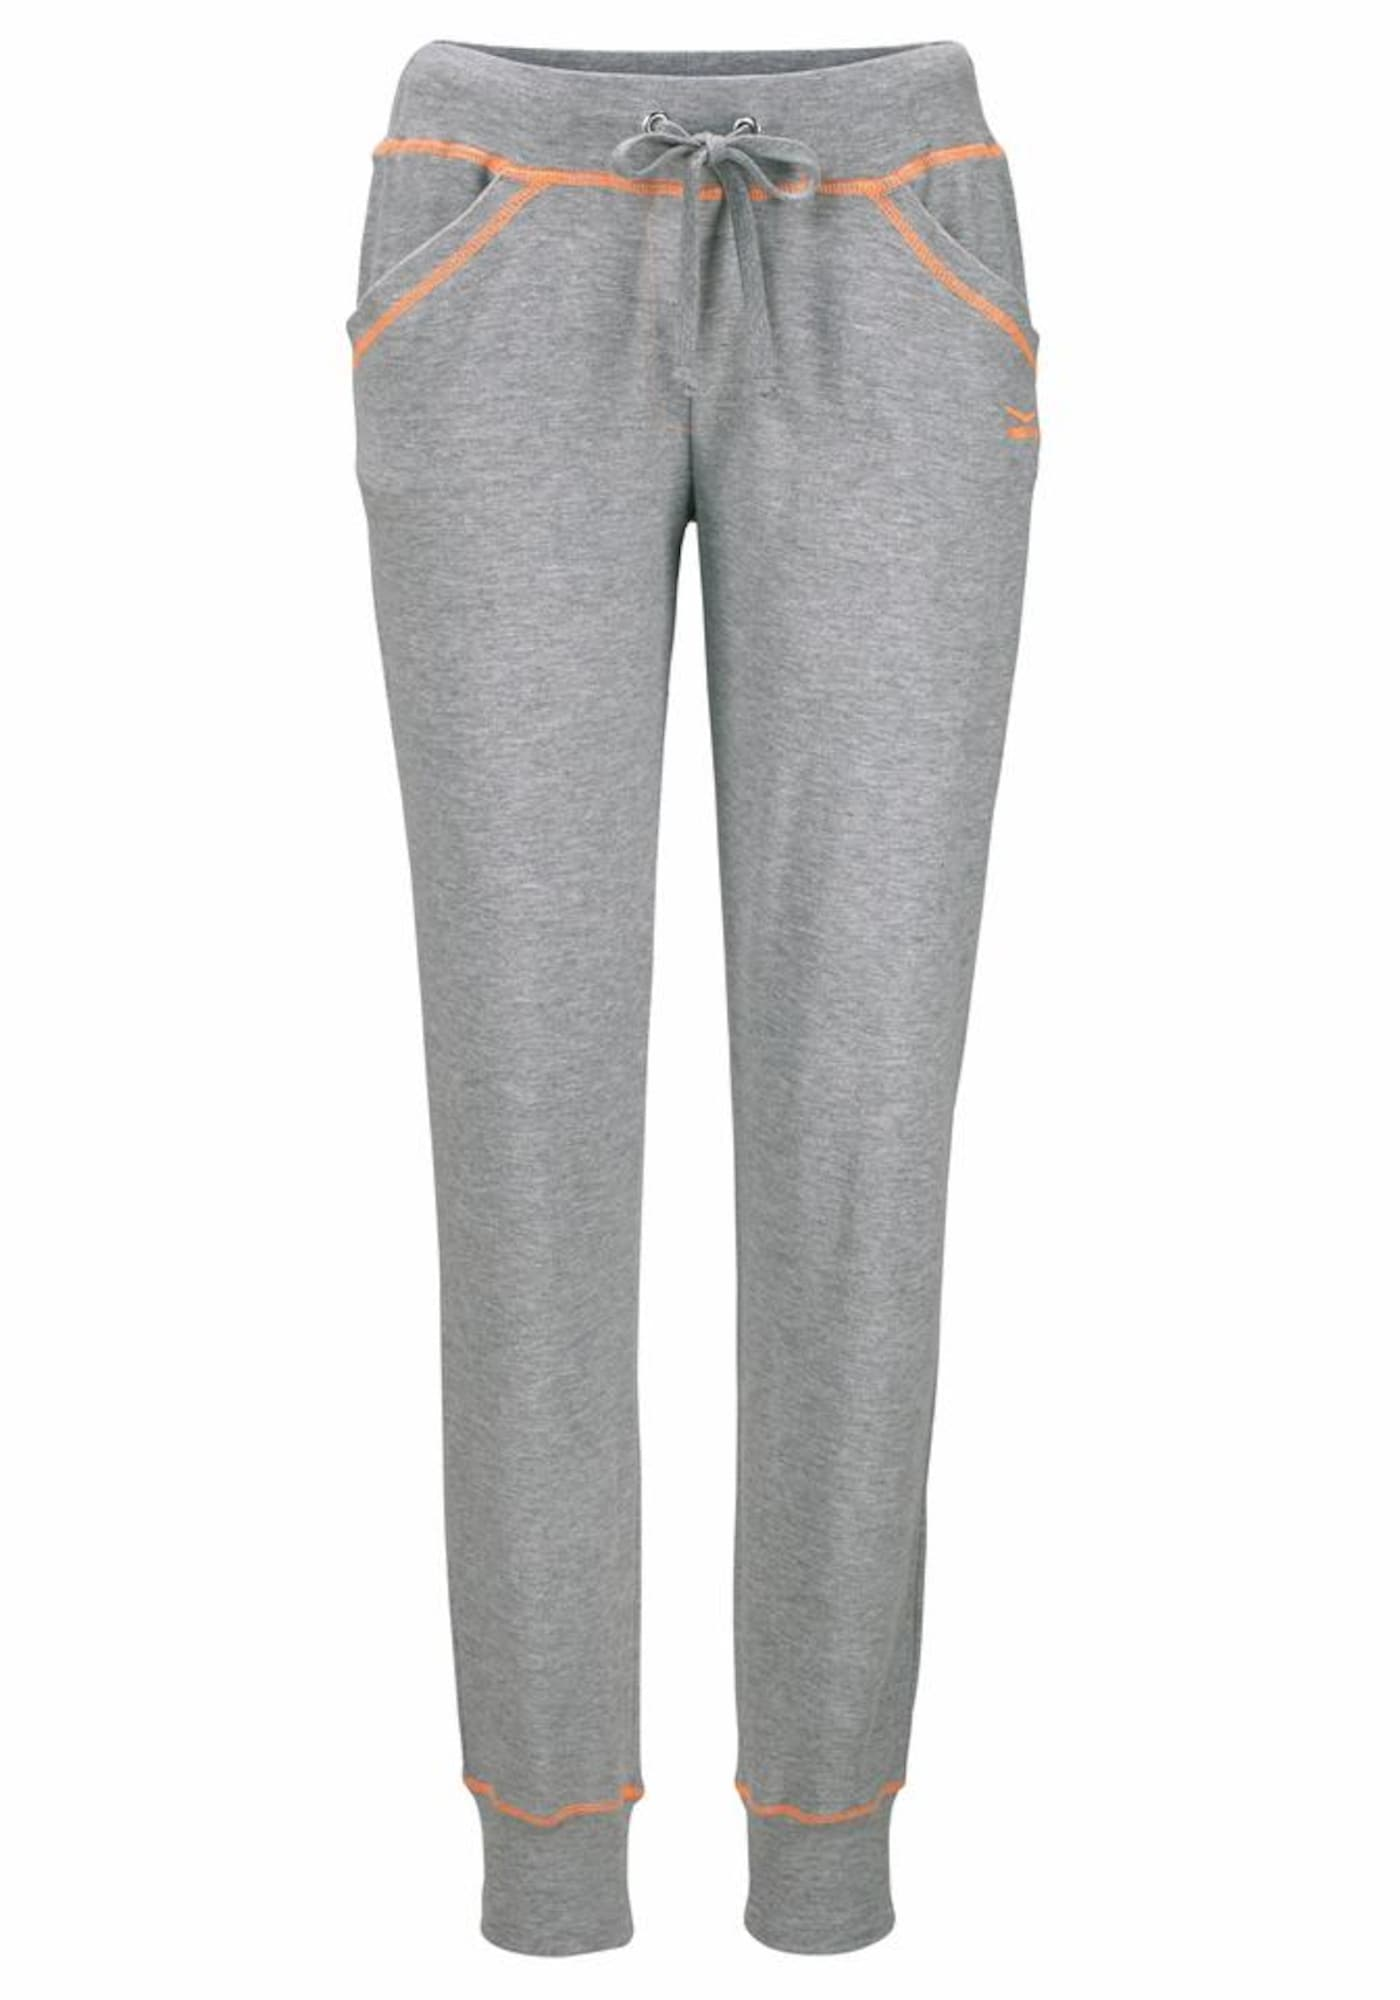 Relaxhose | Bekleidung > Homewear > Relaxhosen | Bench